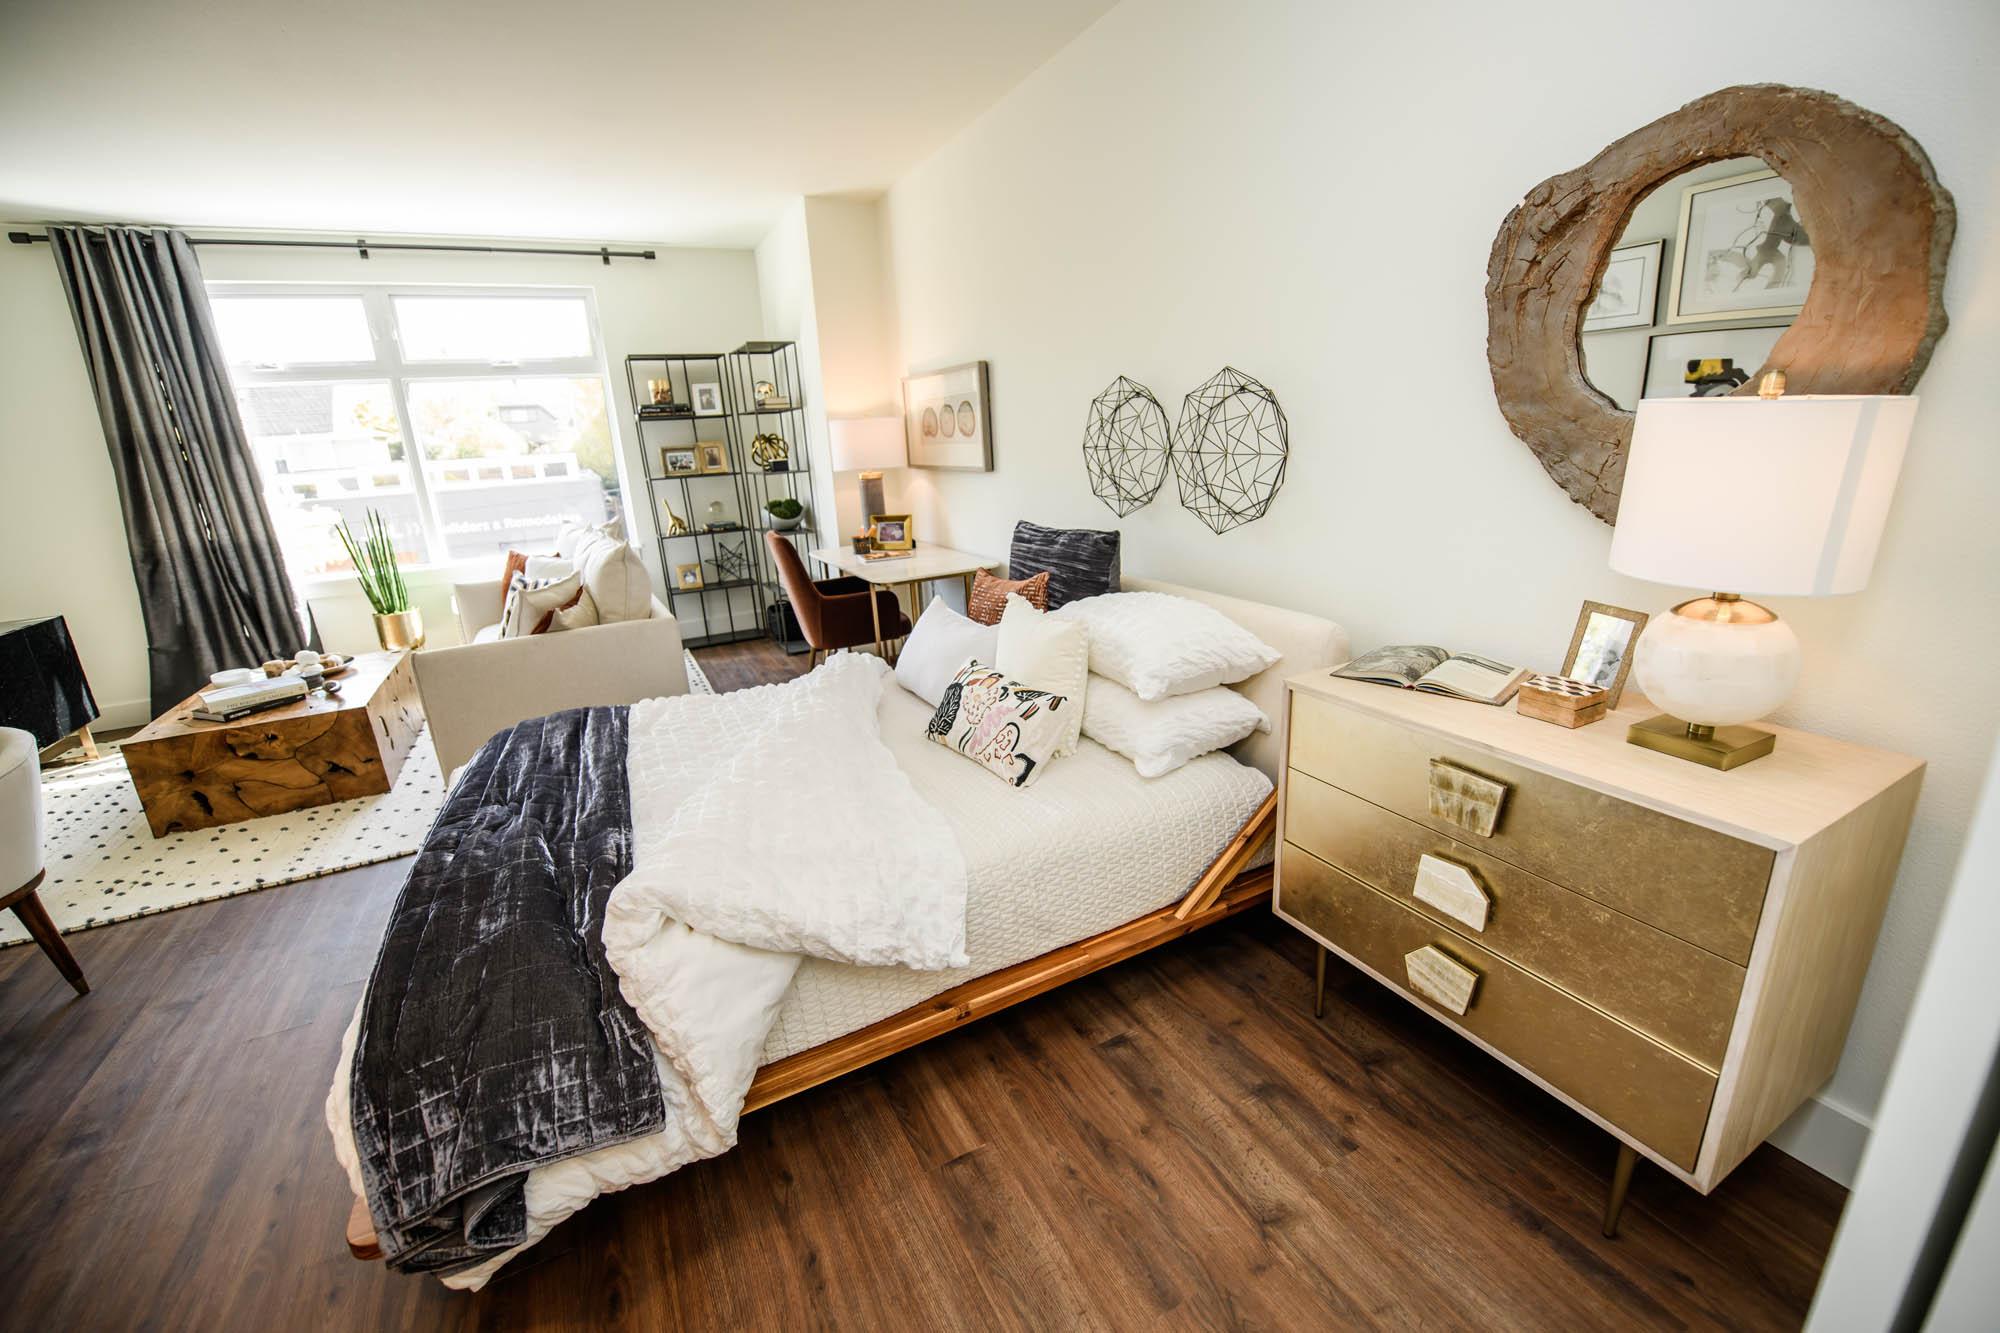 Studio bedroom and living room